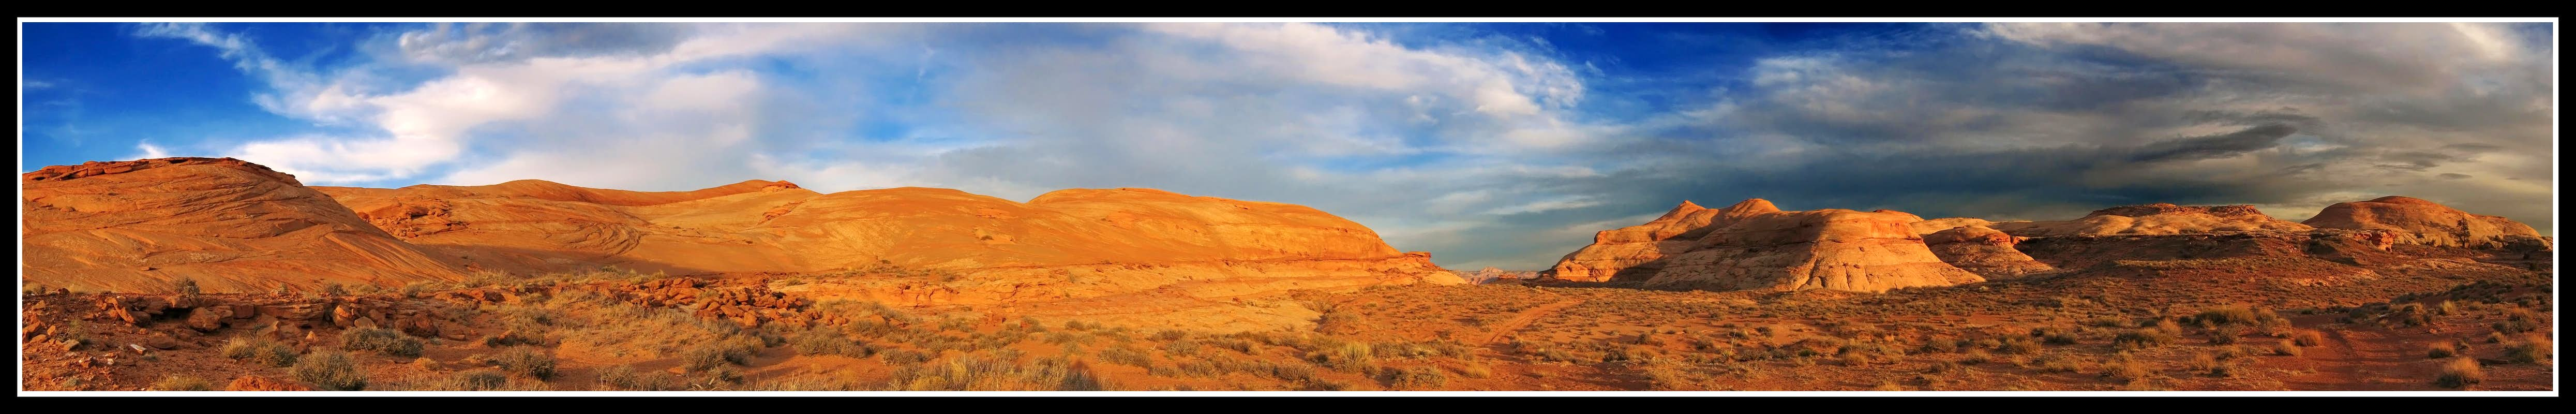 Happy Canyon Narrows : Canyoneering : SummitPost